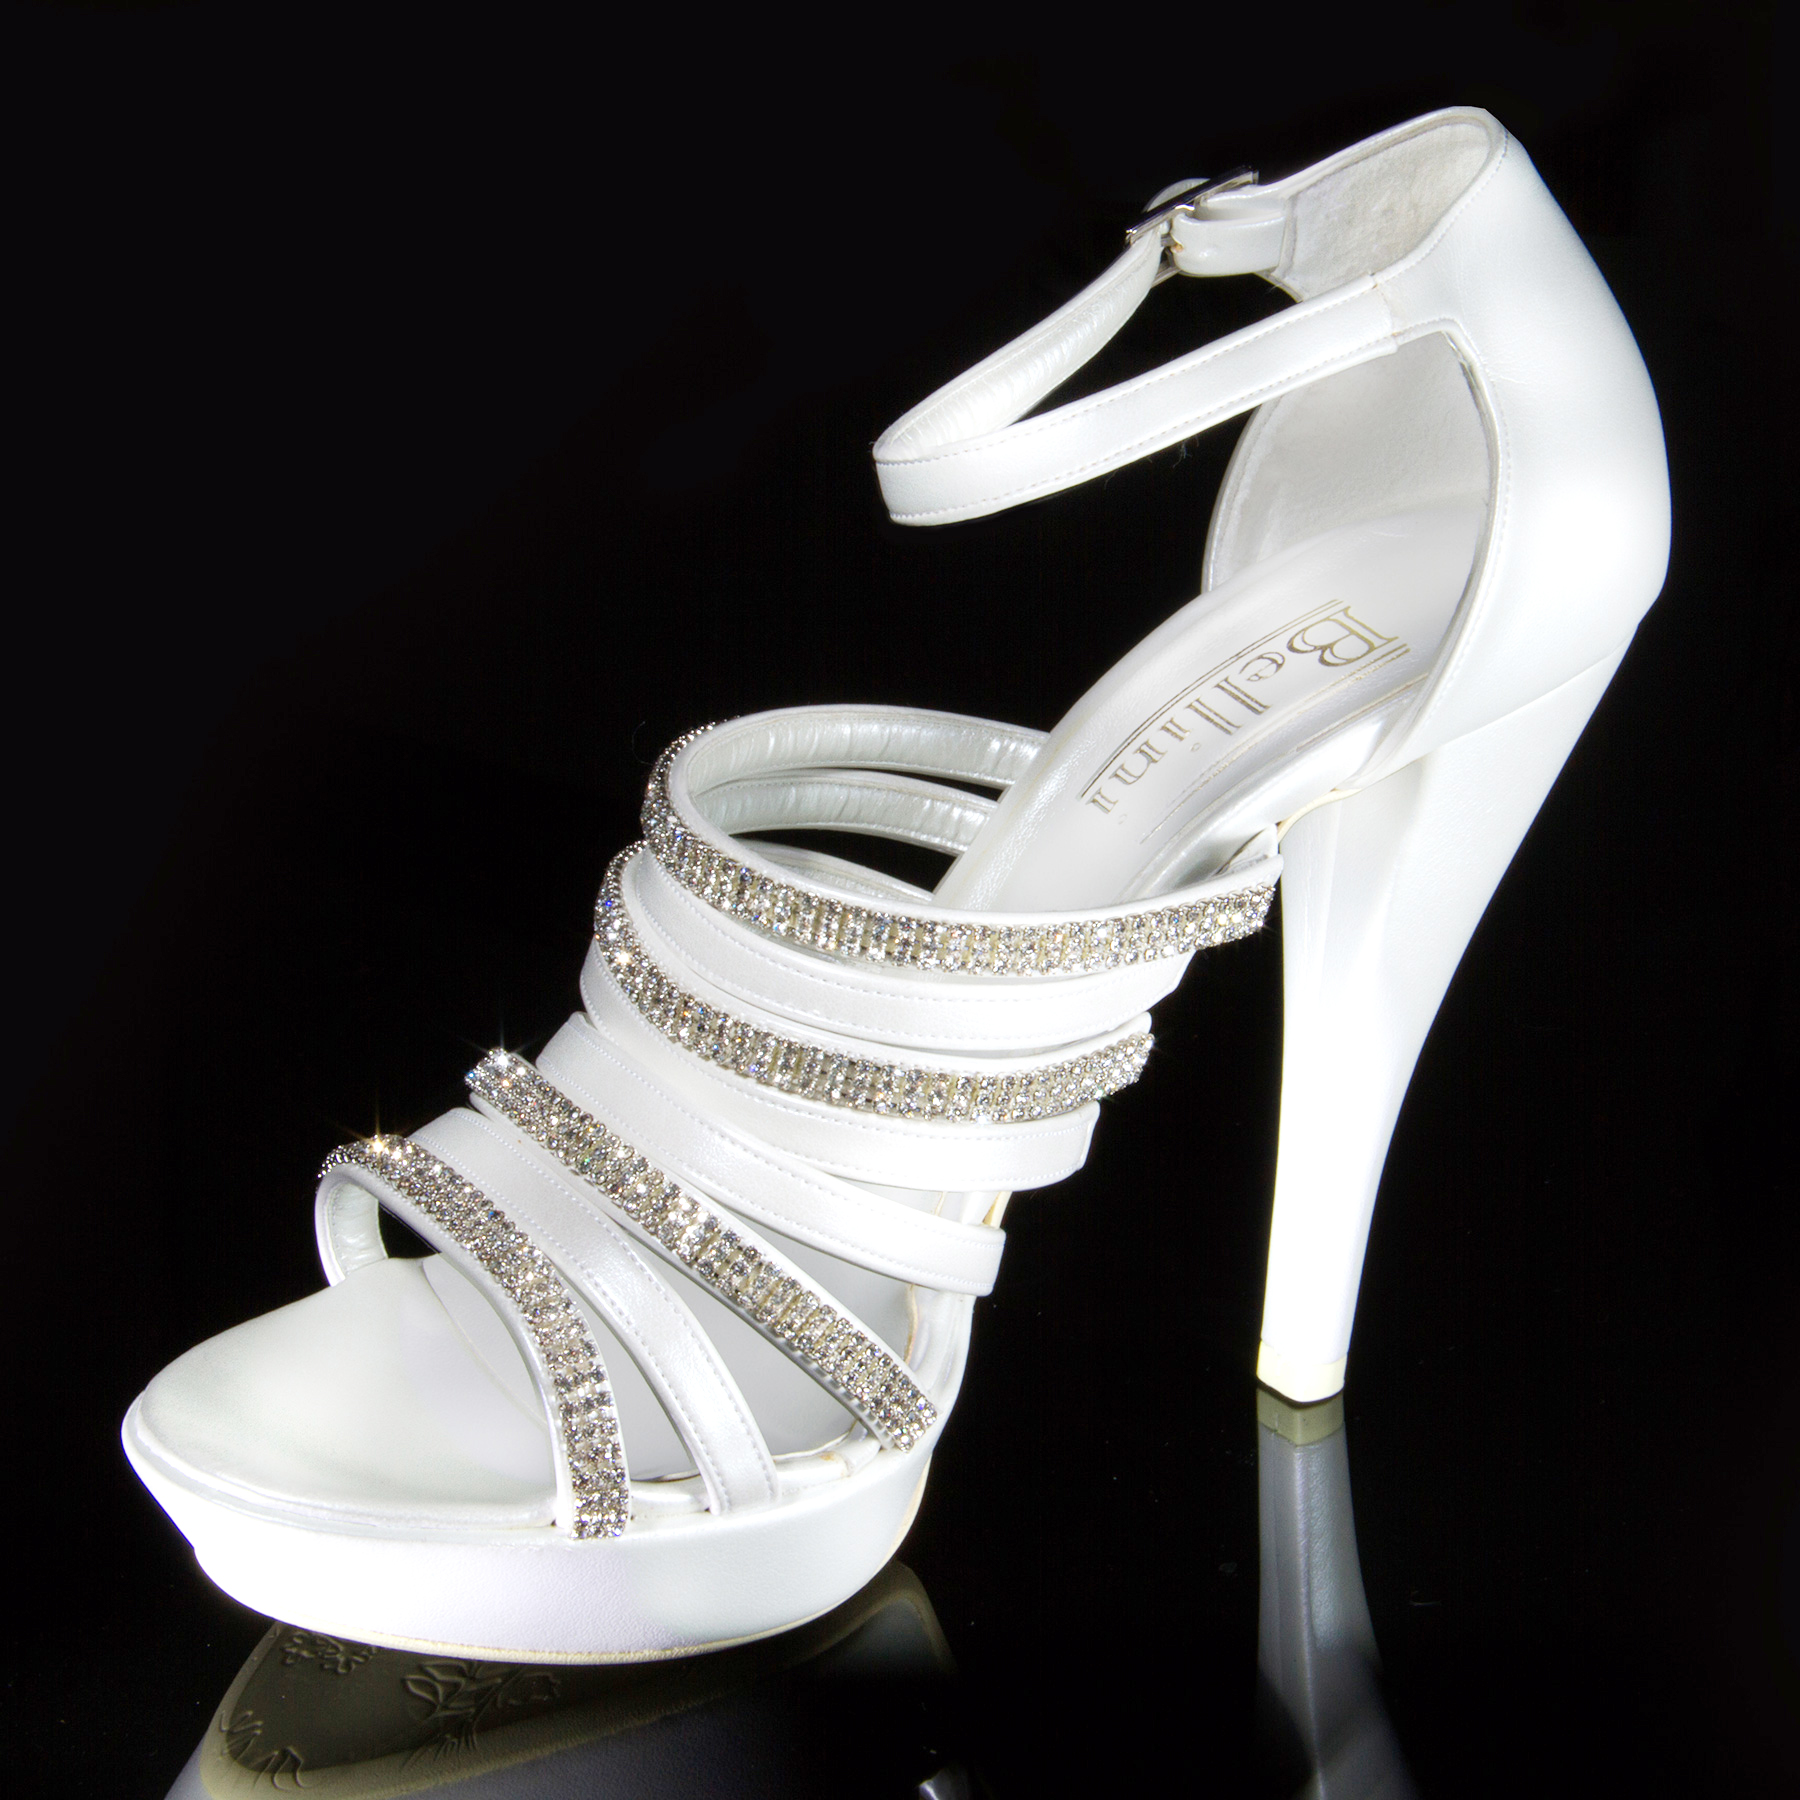 scarpe_sposa_3_marco_resta.jpg